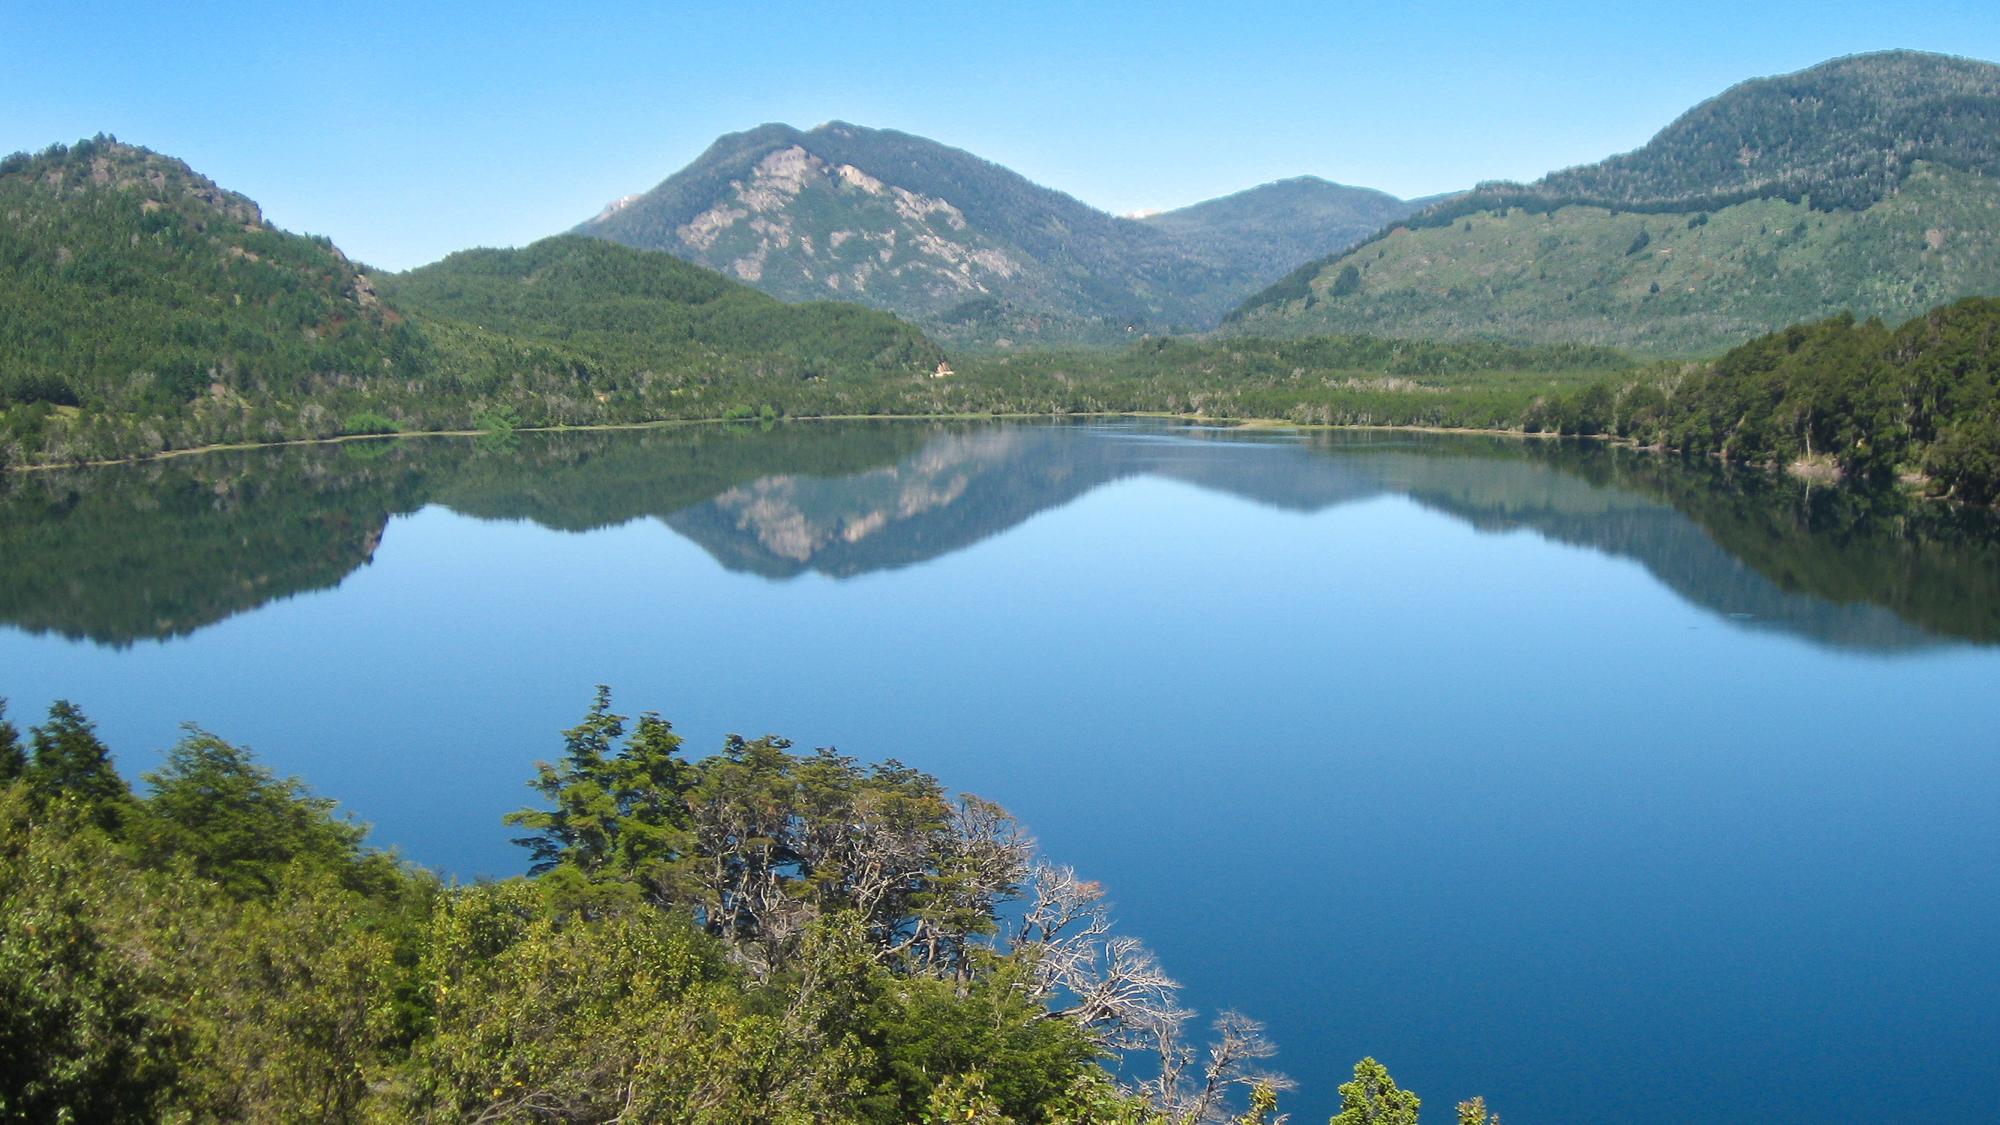 Filo Hua Hum lake, Argentina